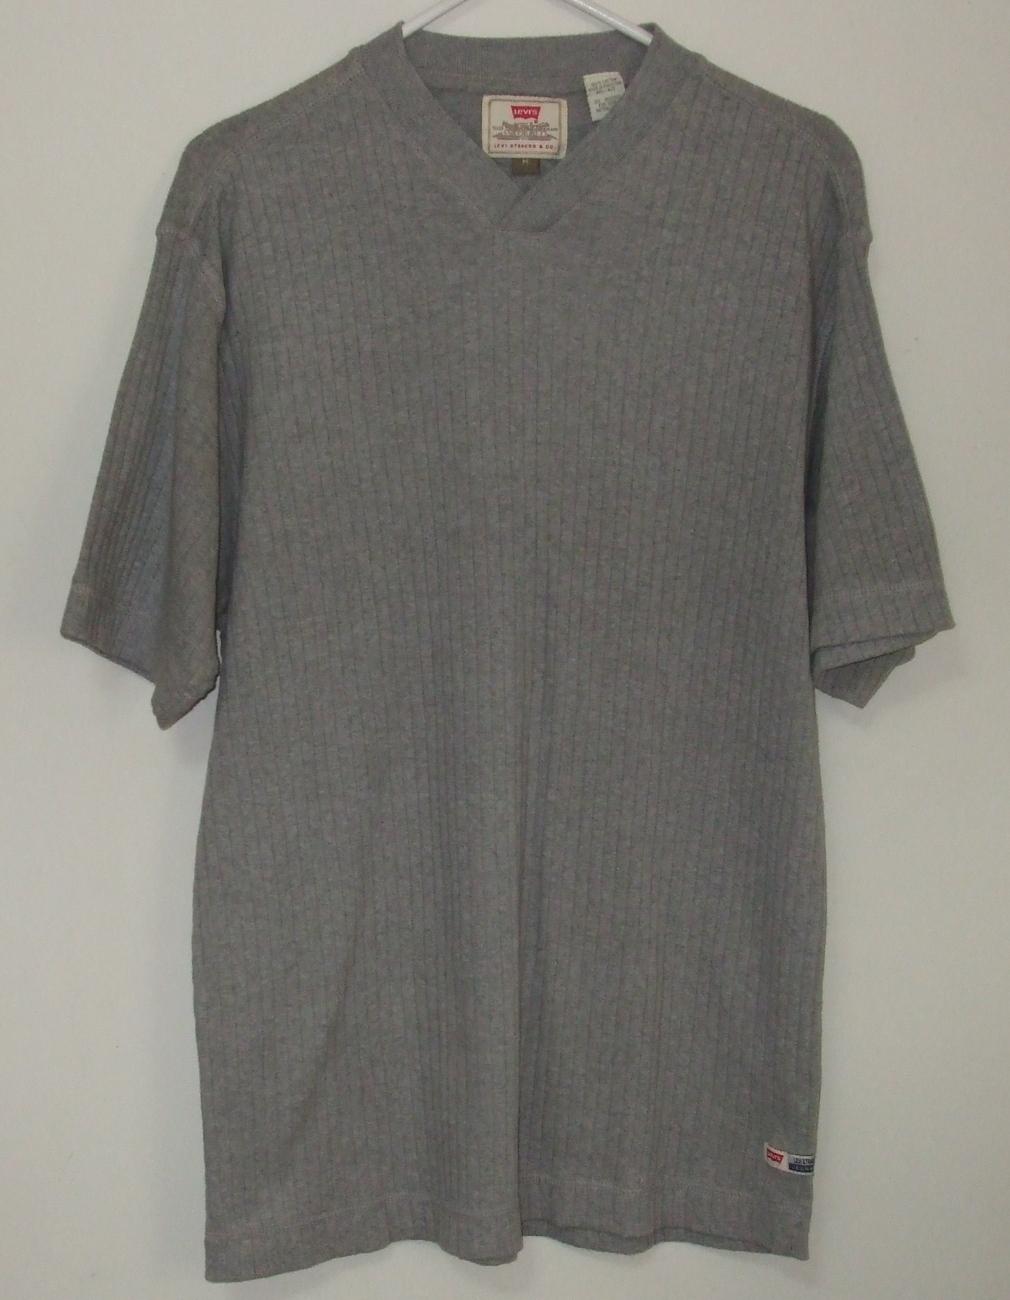 Mens Levis Short Sleeve V Neck Gray Shirt Size M - $12.95